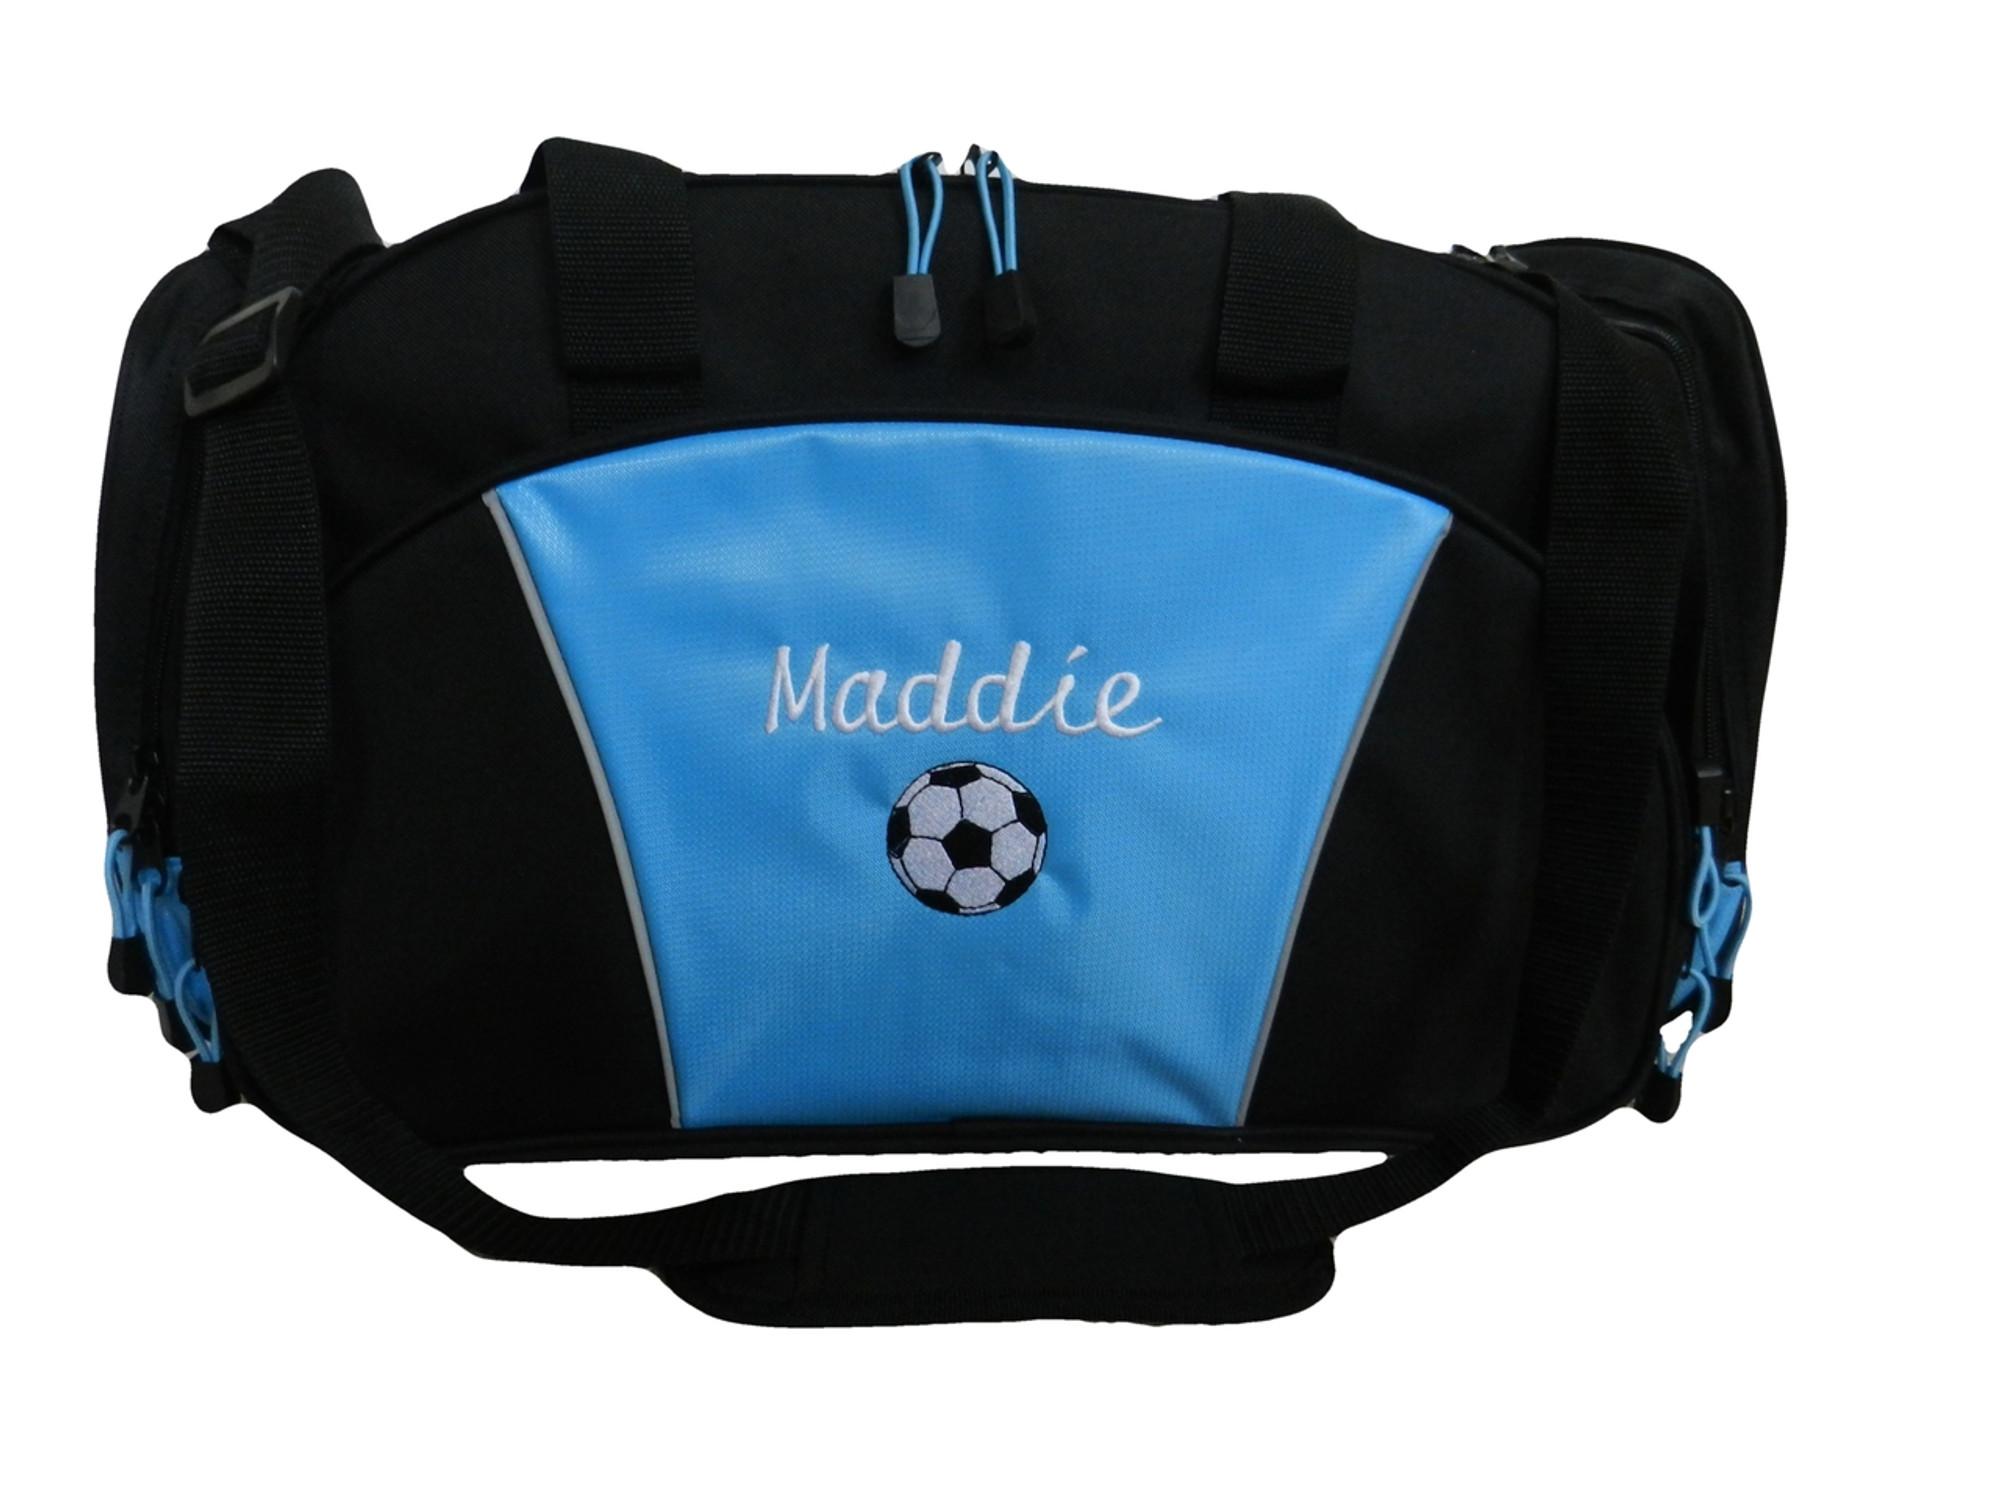 29a7d34da ... Soccer Ball Coach Mom Team Personalized Embroidered LIGHT BLUE DUFFEL  Font Style CURSIVE ...